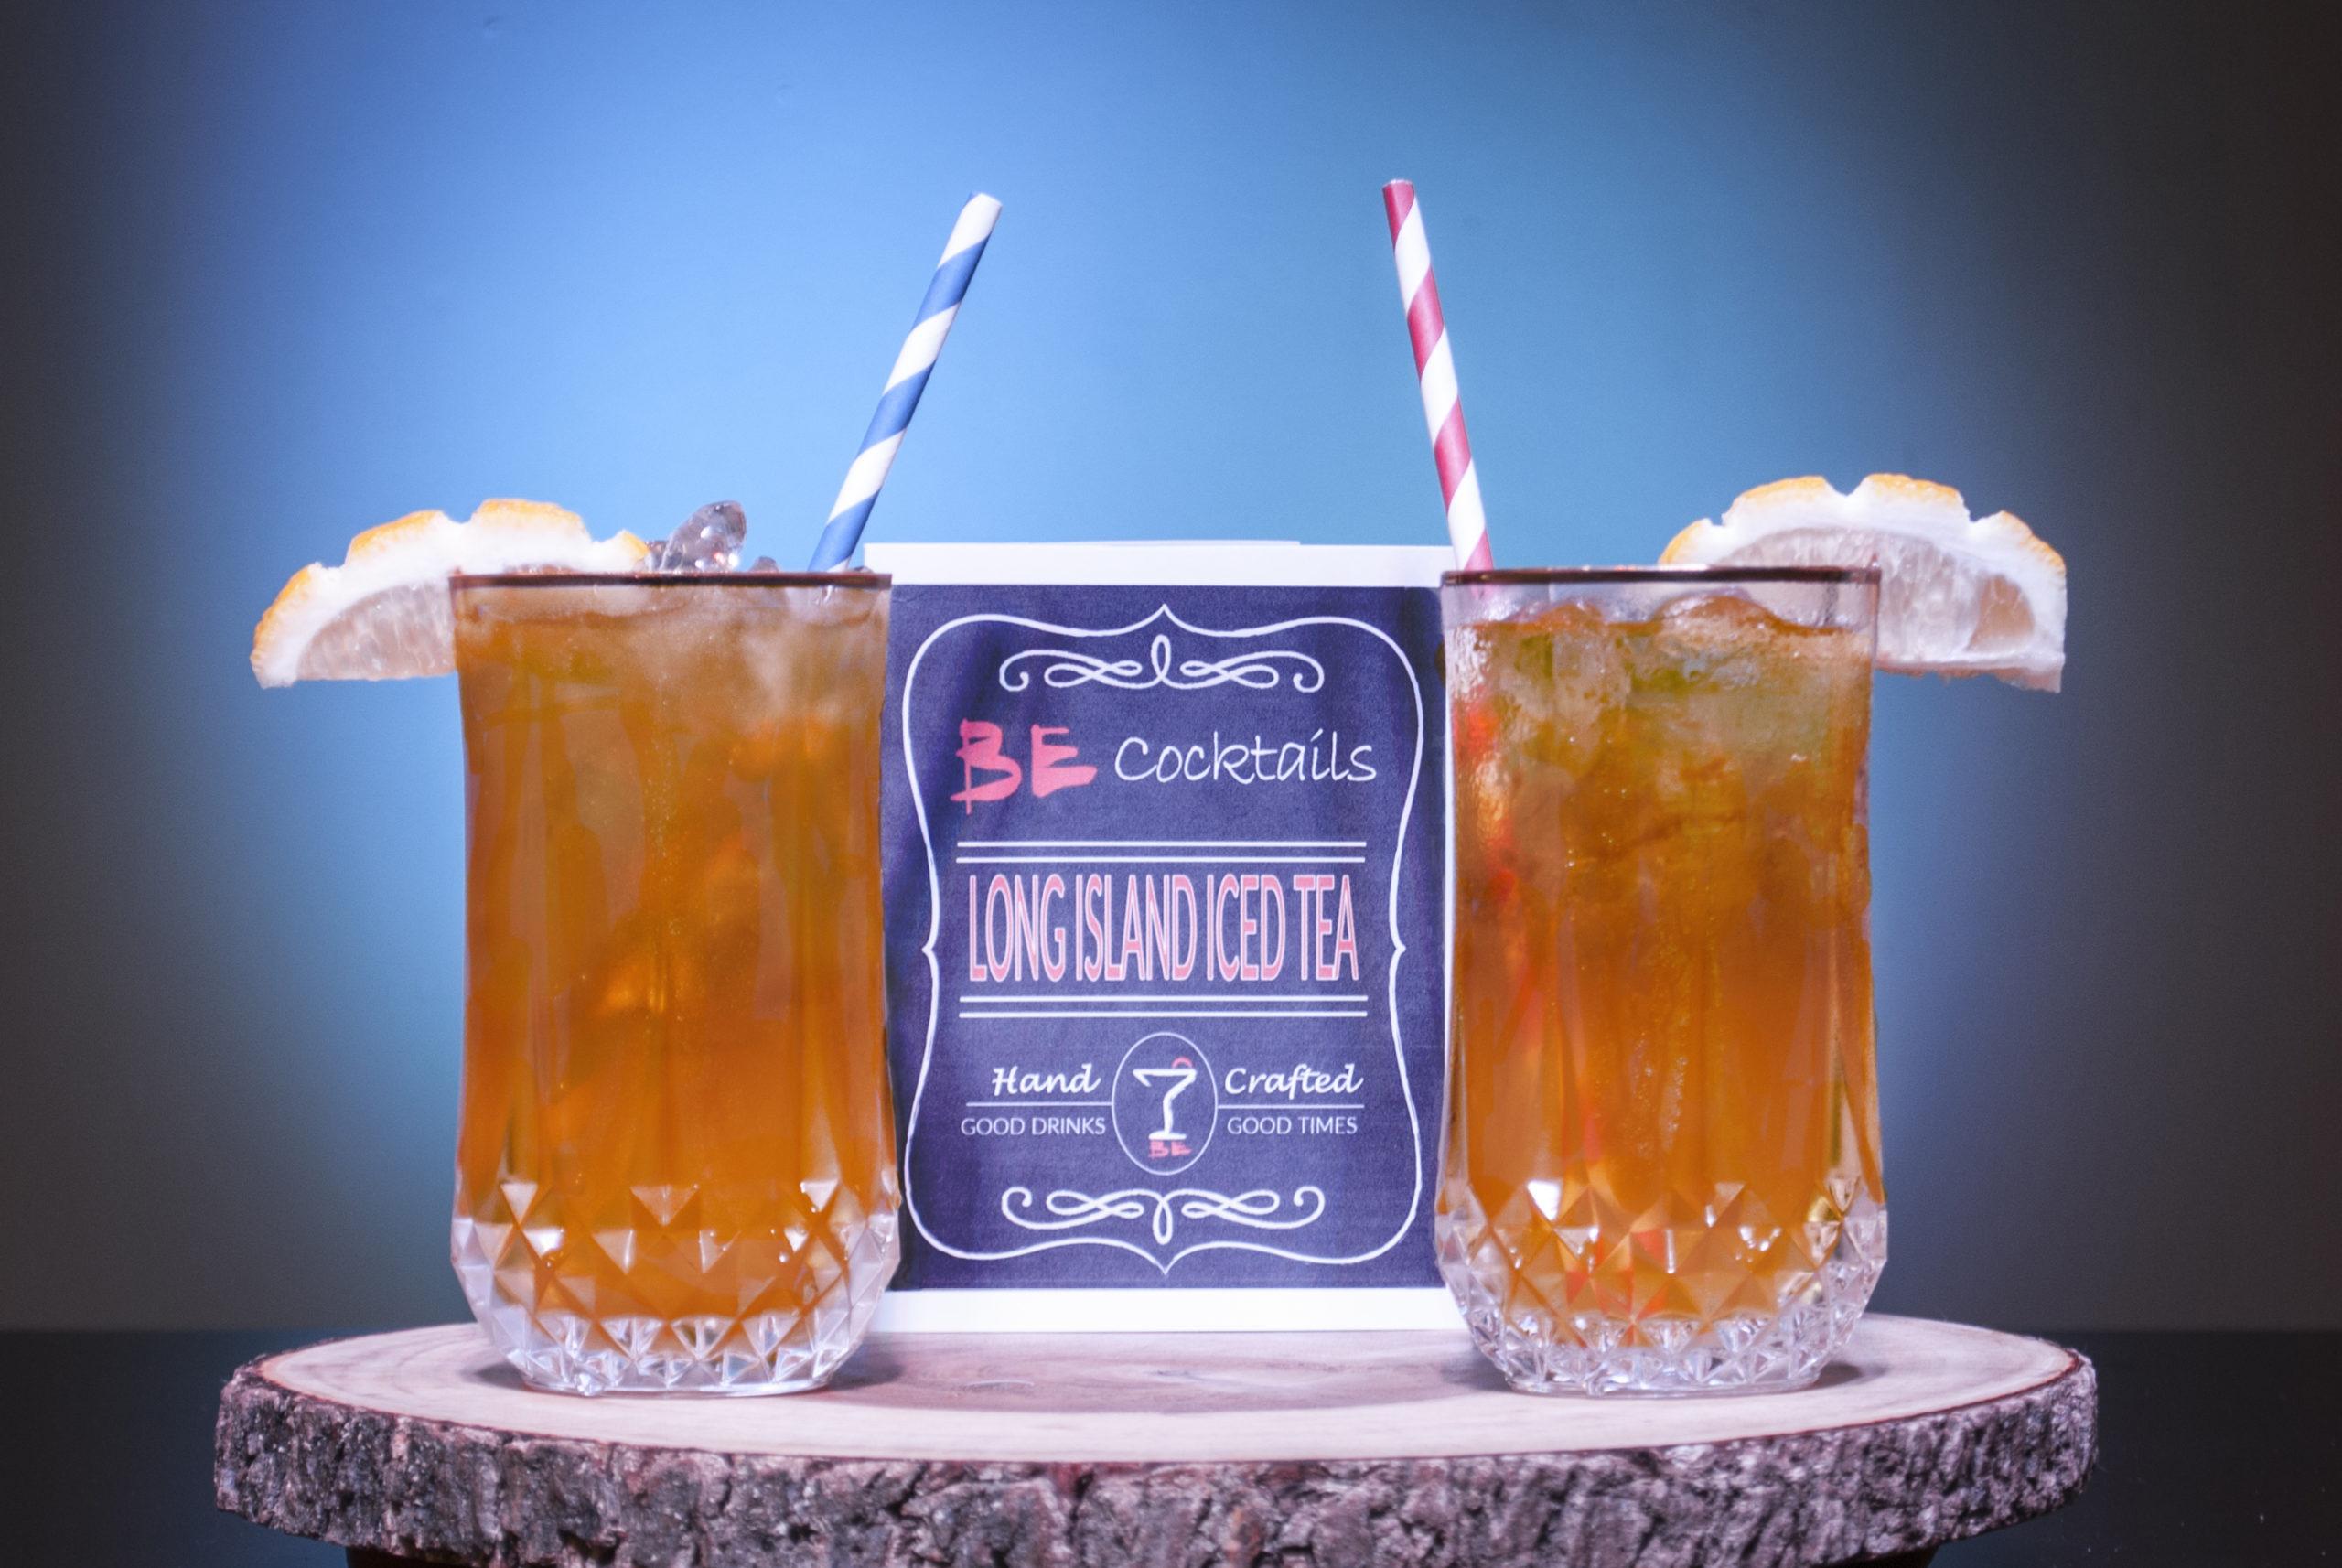 Long Island Iced Tea Kit Barman Emporium